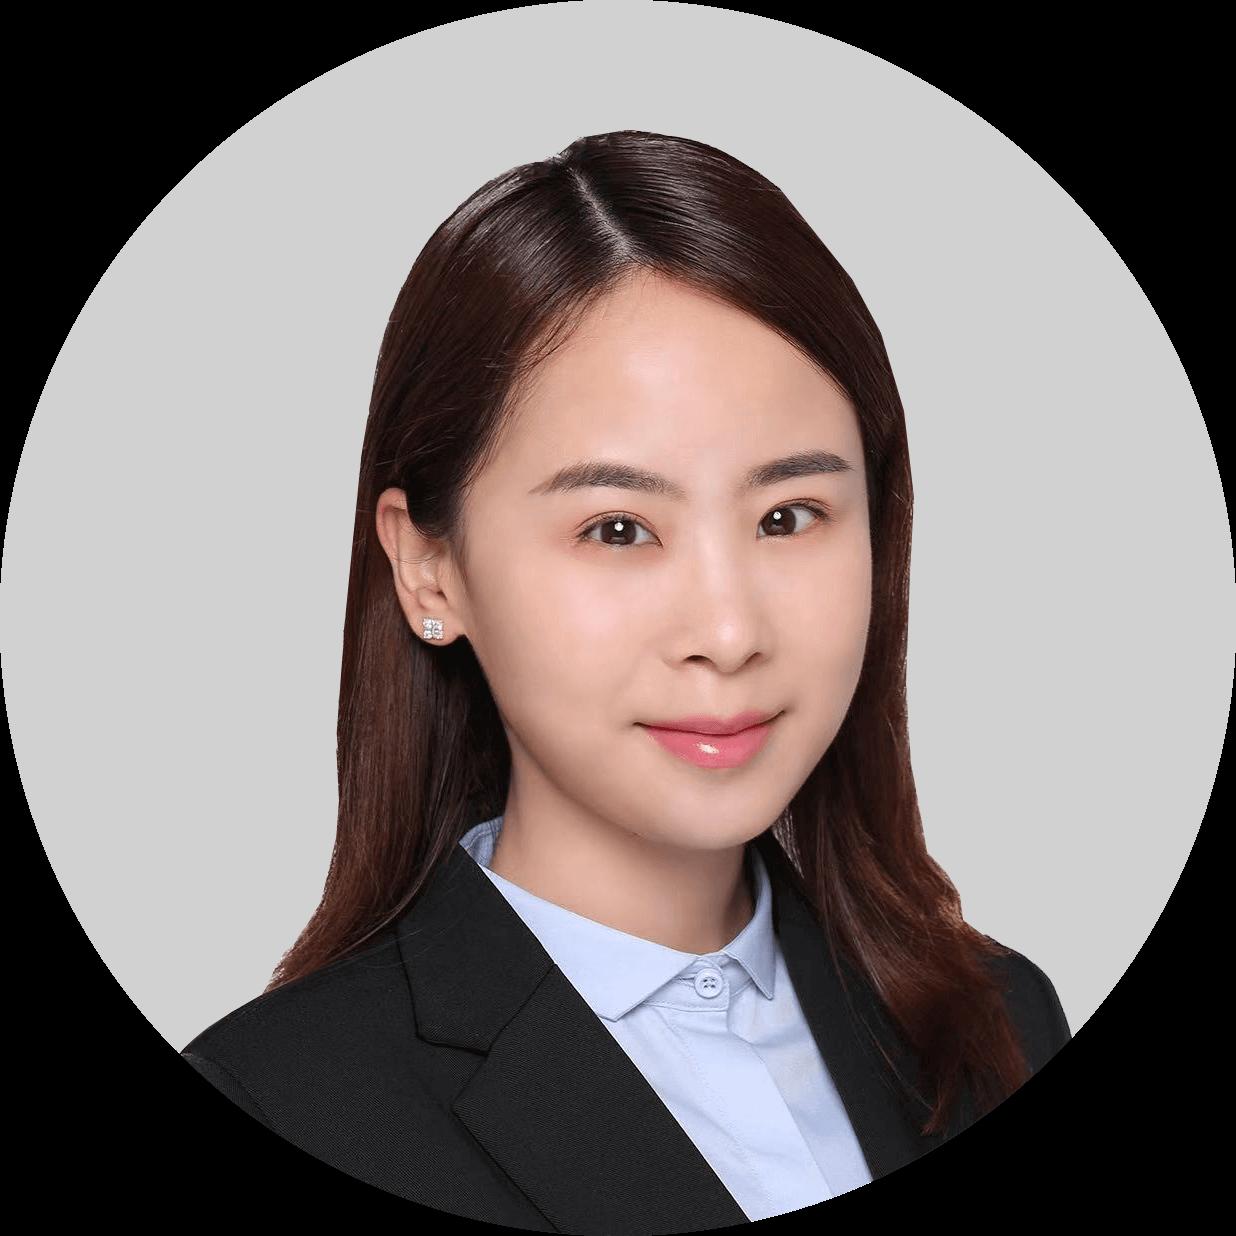 Ms Xie Lingling